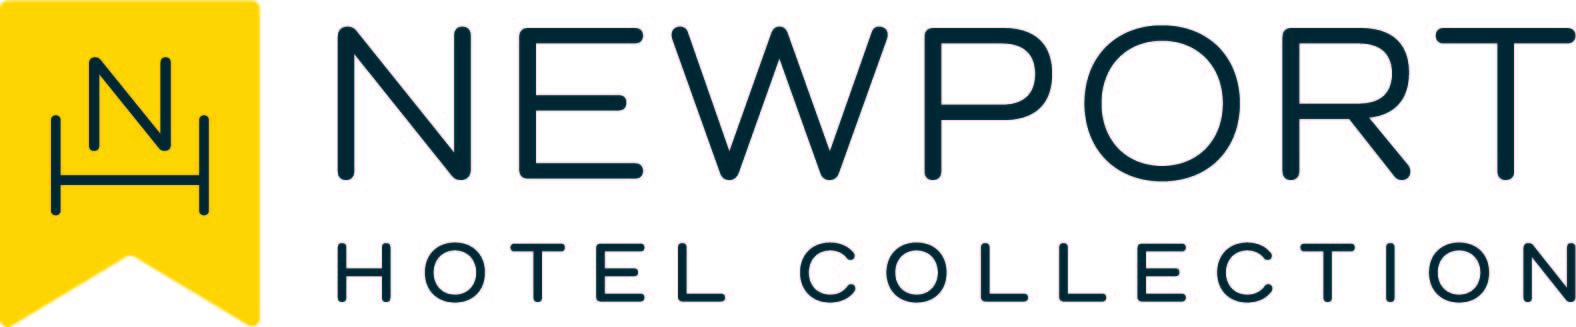 Newport_Hotel_Collection_logo_JPEG